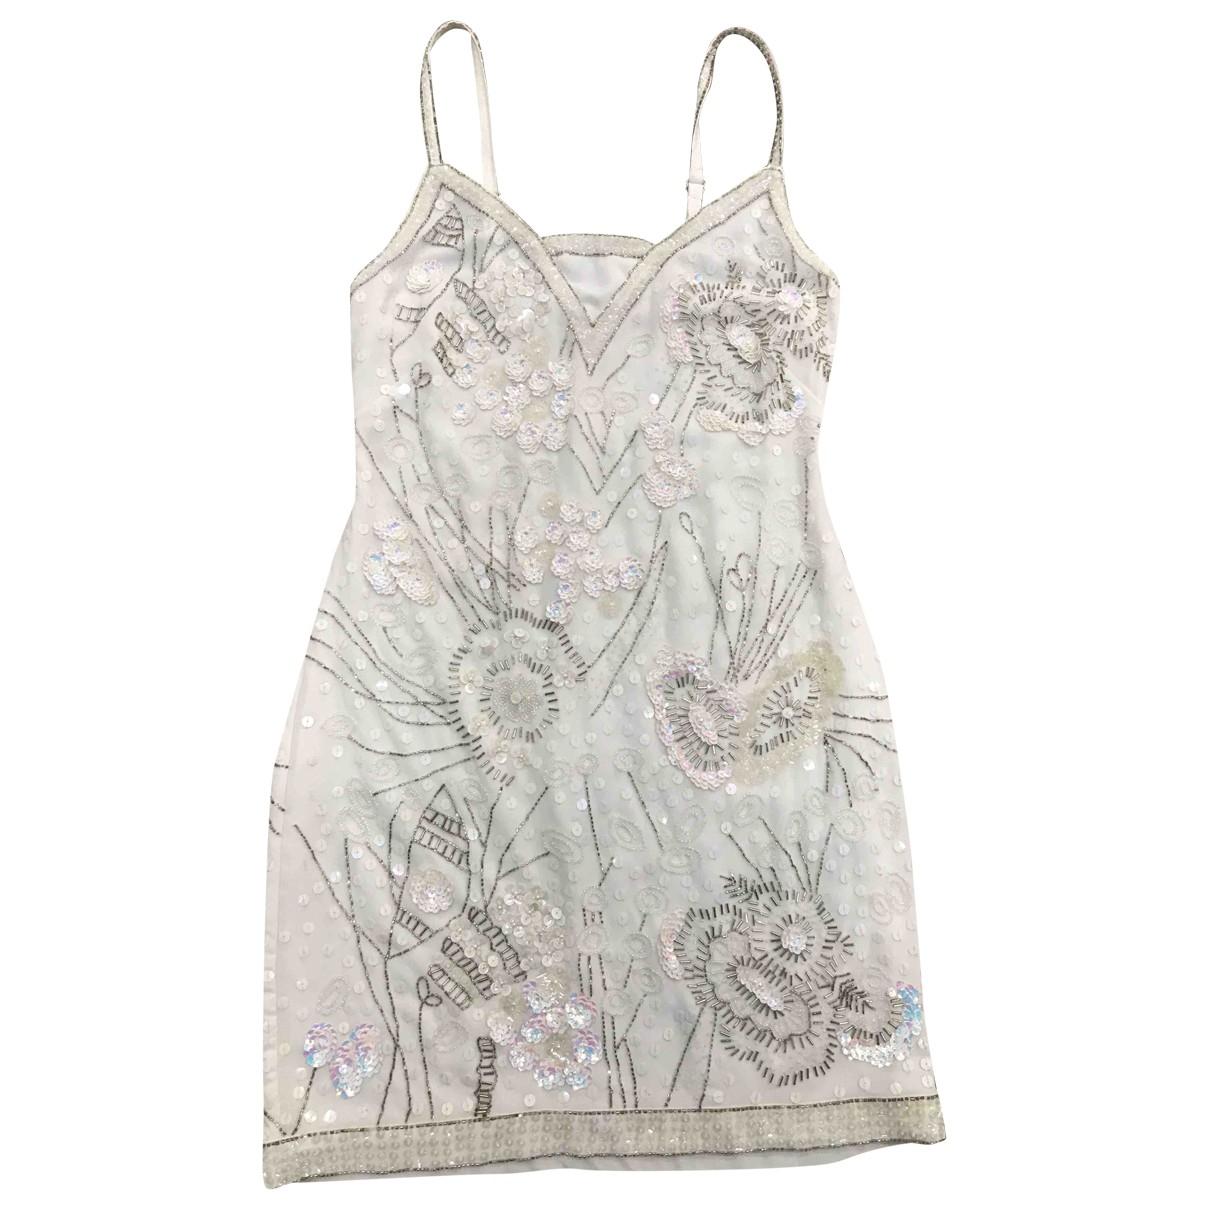 Yoana Baraschi \N Kleid in  Weiss Polyester